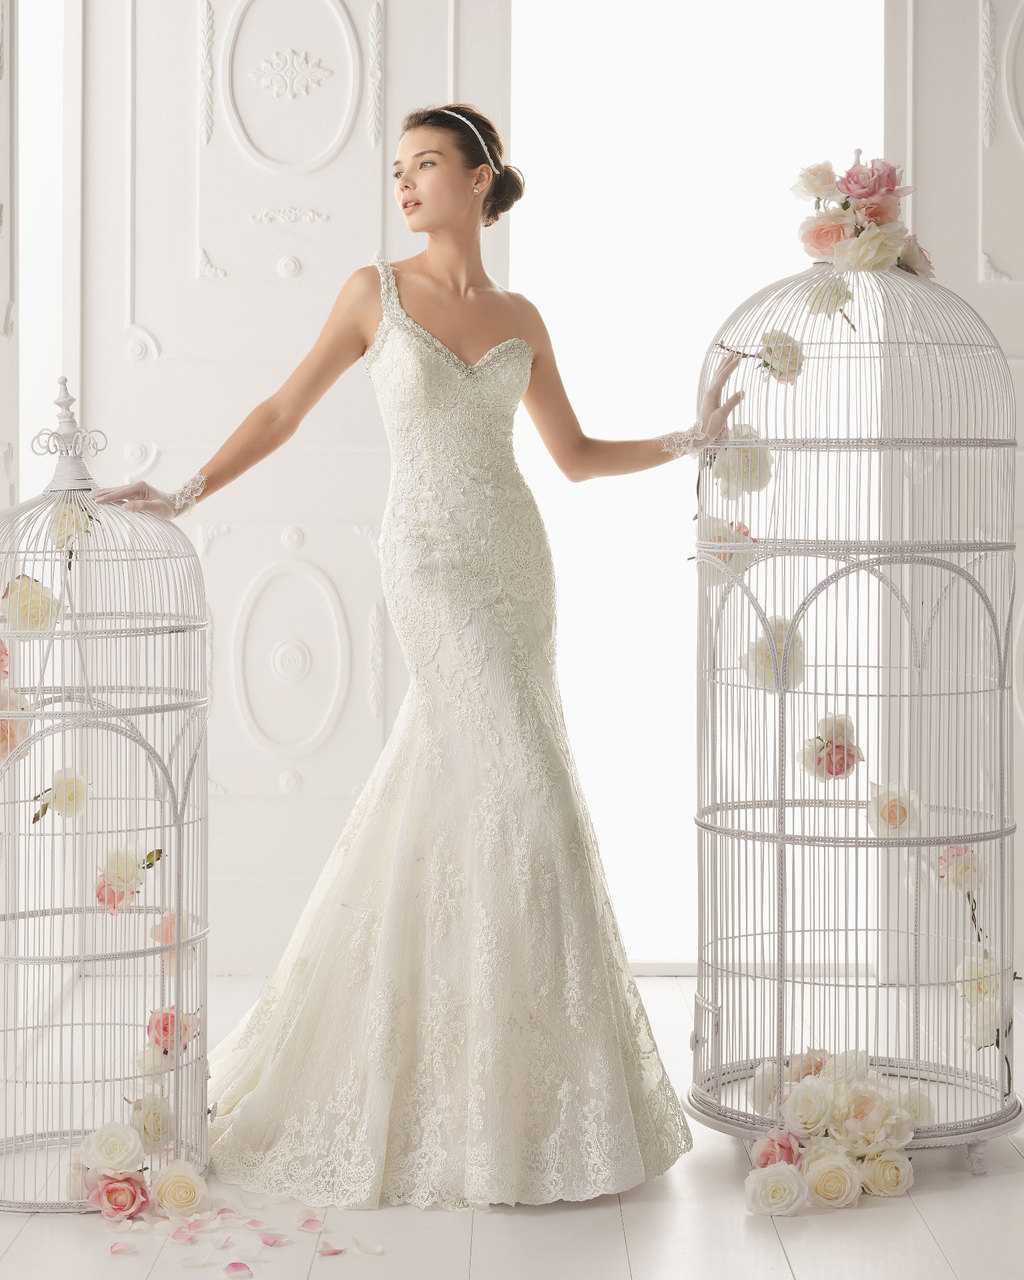 Aire-barcelona-wedding-dress-2014-bridal-ovacion.full